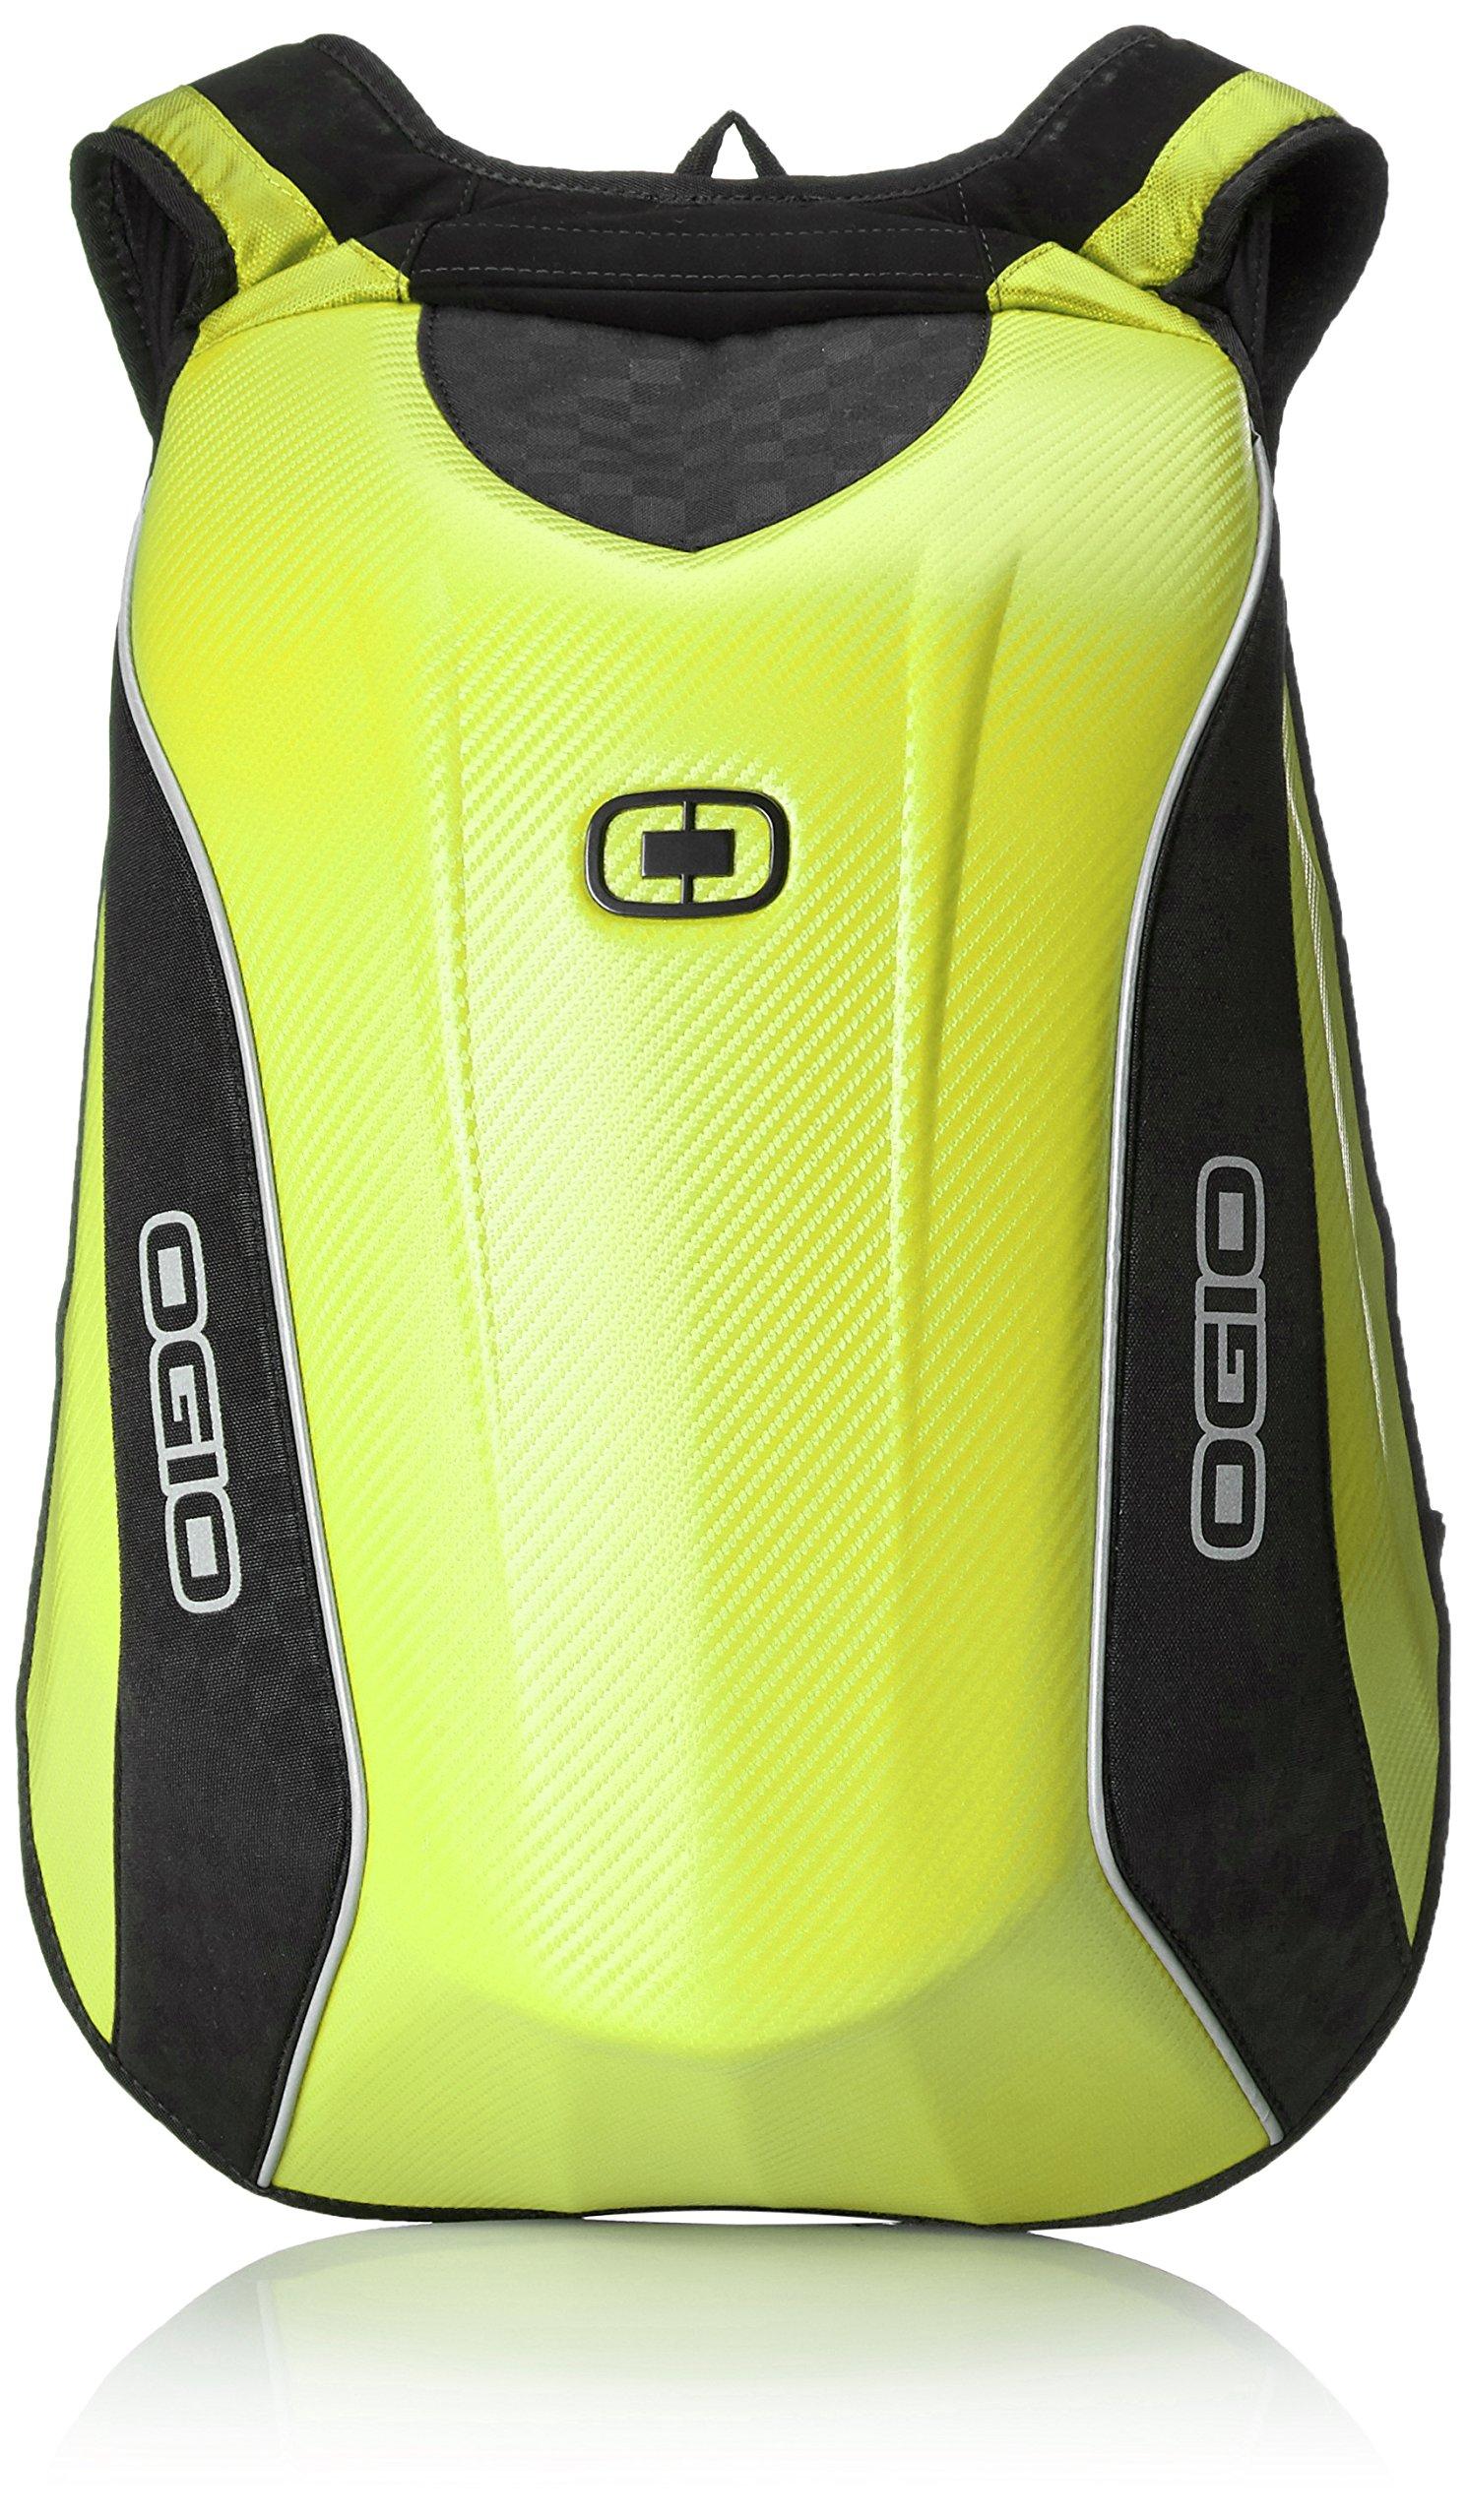 Ogio No Drag Mach 5 Hi-Viz Yellow Backpack - One Size